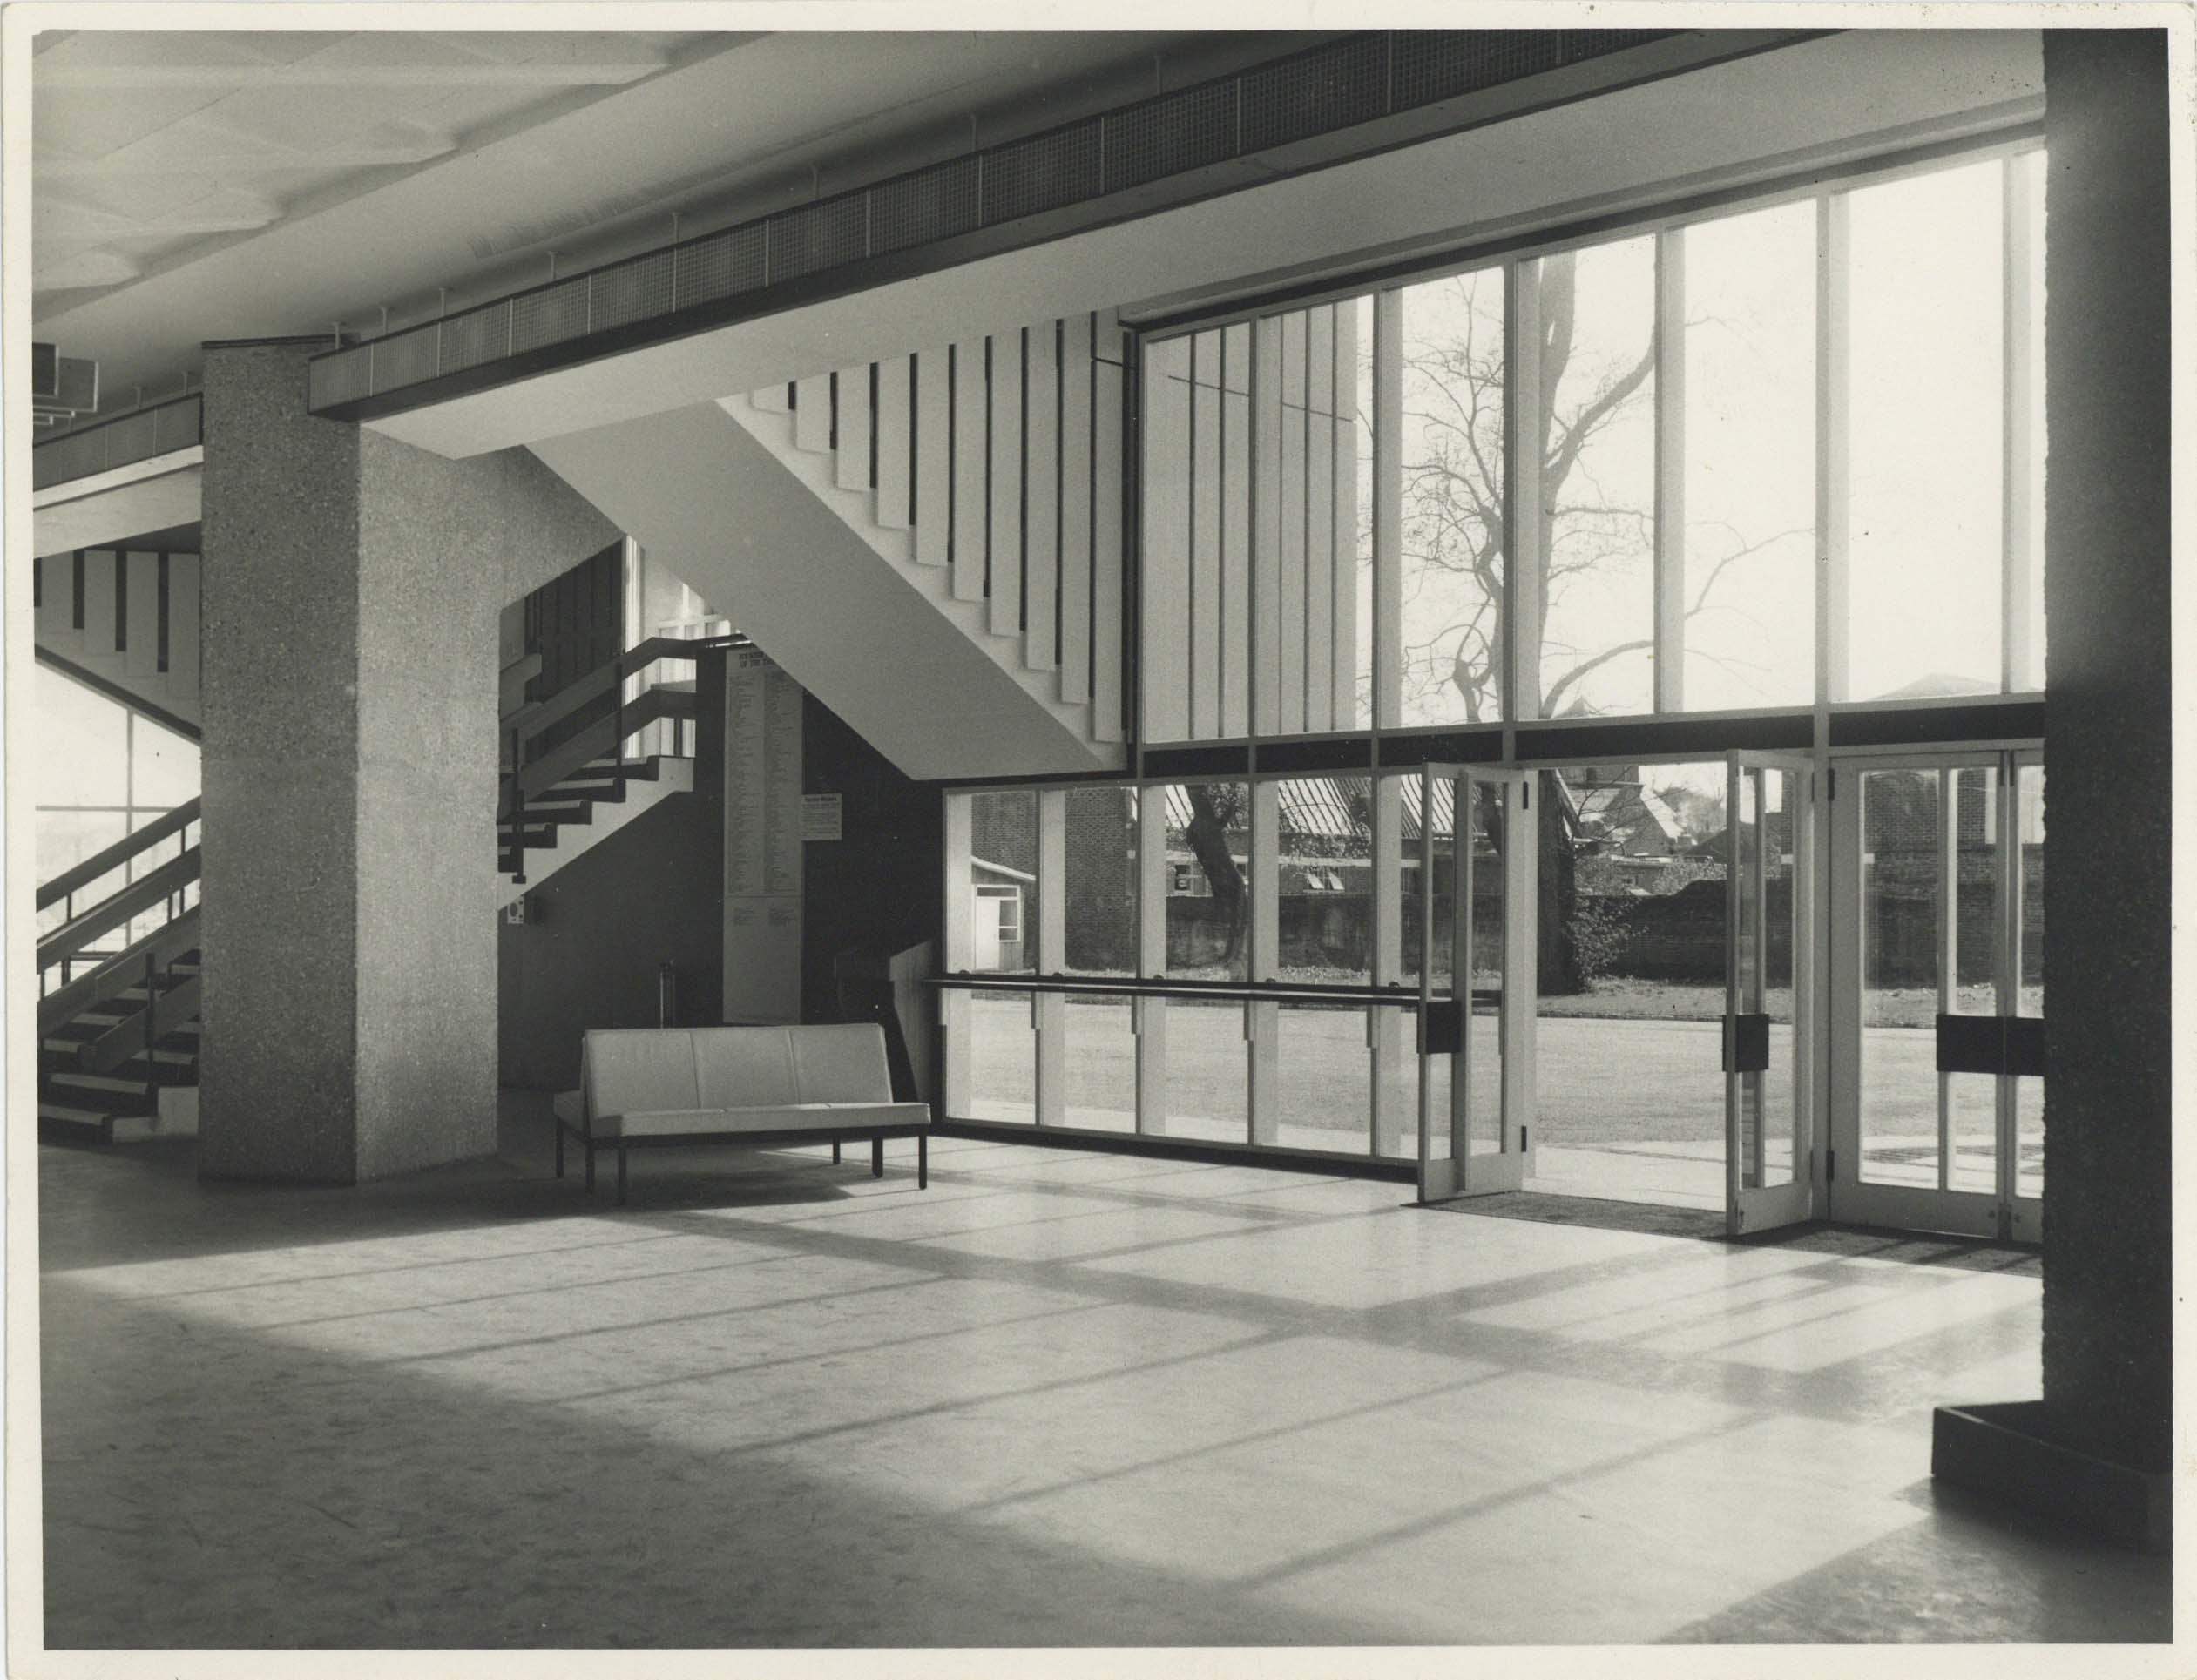 Photograph Interior Foyer - Photographer unknown - Date unknown - Box 71 CFT WSRO - H21xW16cm